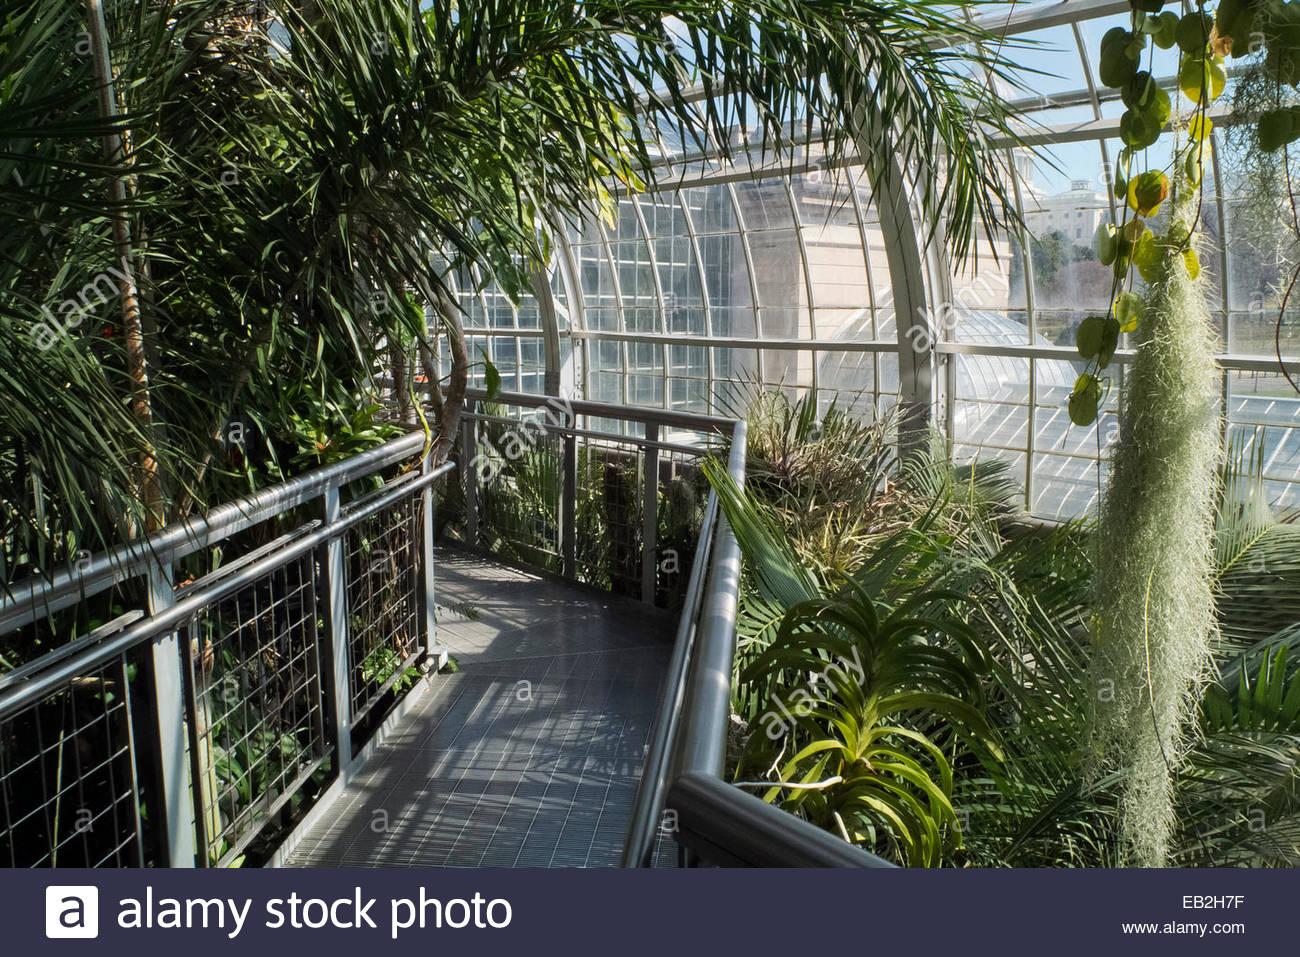 inside the us botanical garden in washington dc stock image - Botanical Garden Washington Dc